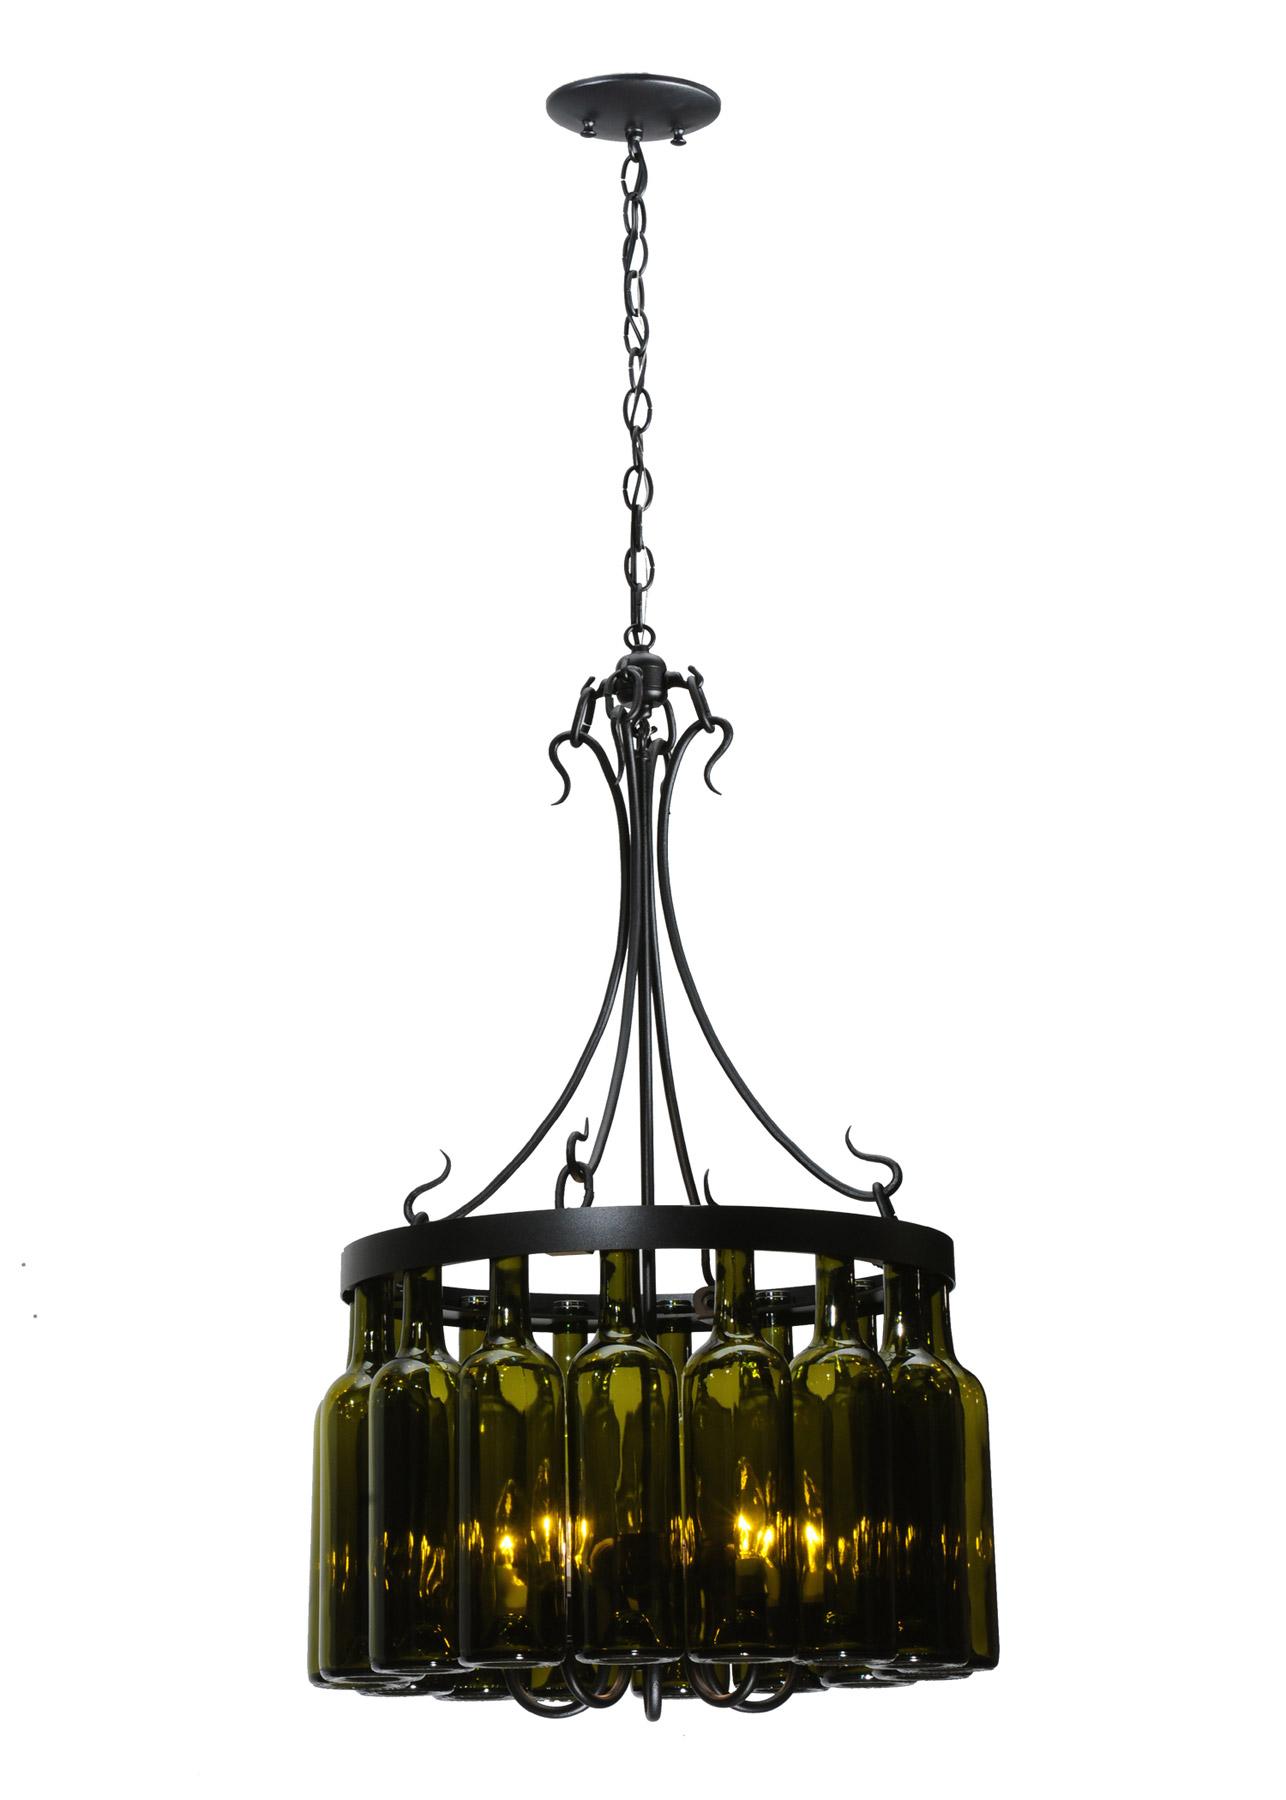 Meyda 114514 Tuscan Vineyard Mini Chandelier